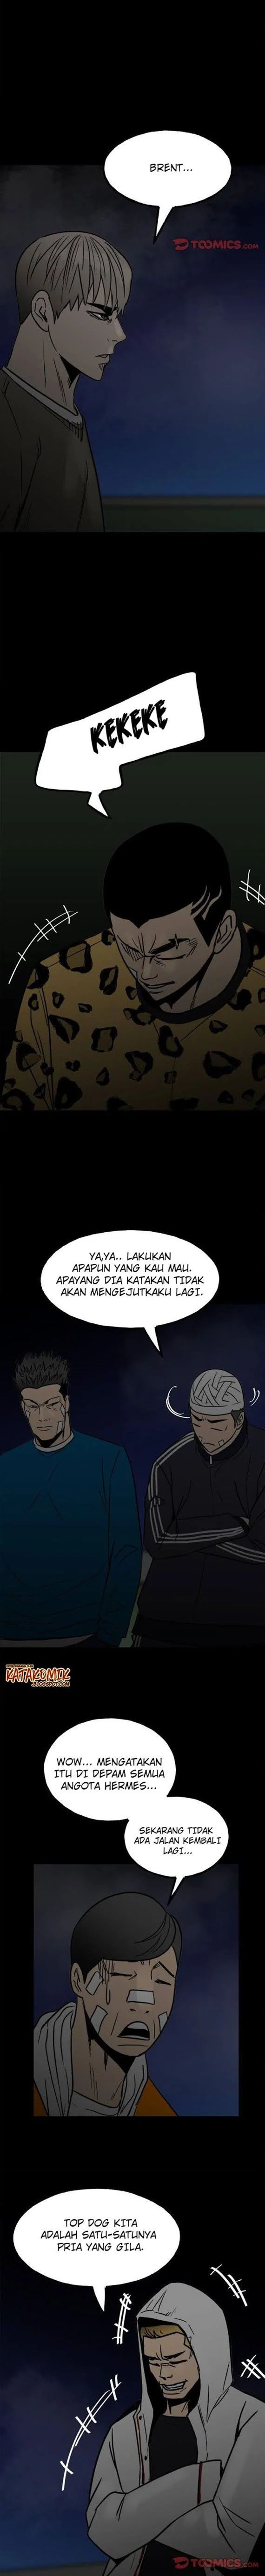 The Villain Chapter 92